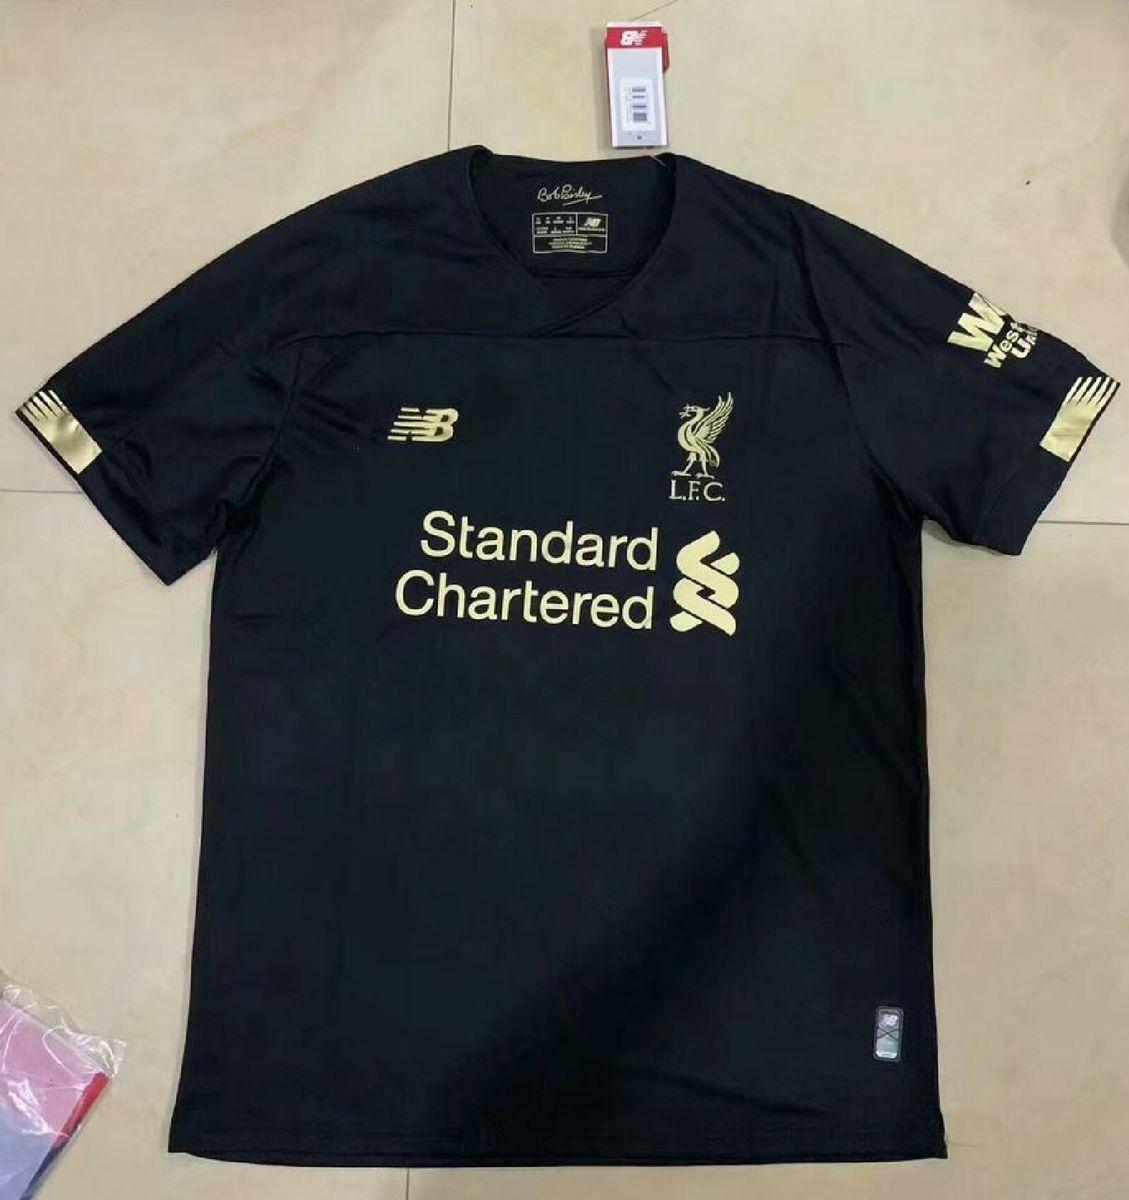 Camisa Do Liverpool 2019 Preta Importada Pronta Entrega Roupa Esportiva Masculino New Balance Nunca Usado 34267219 Enjoei